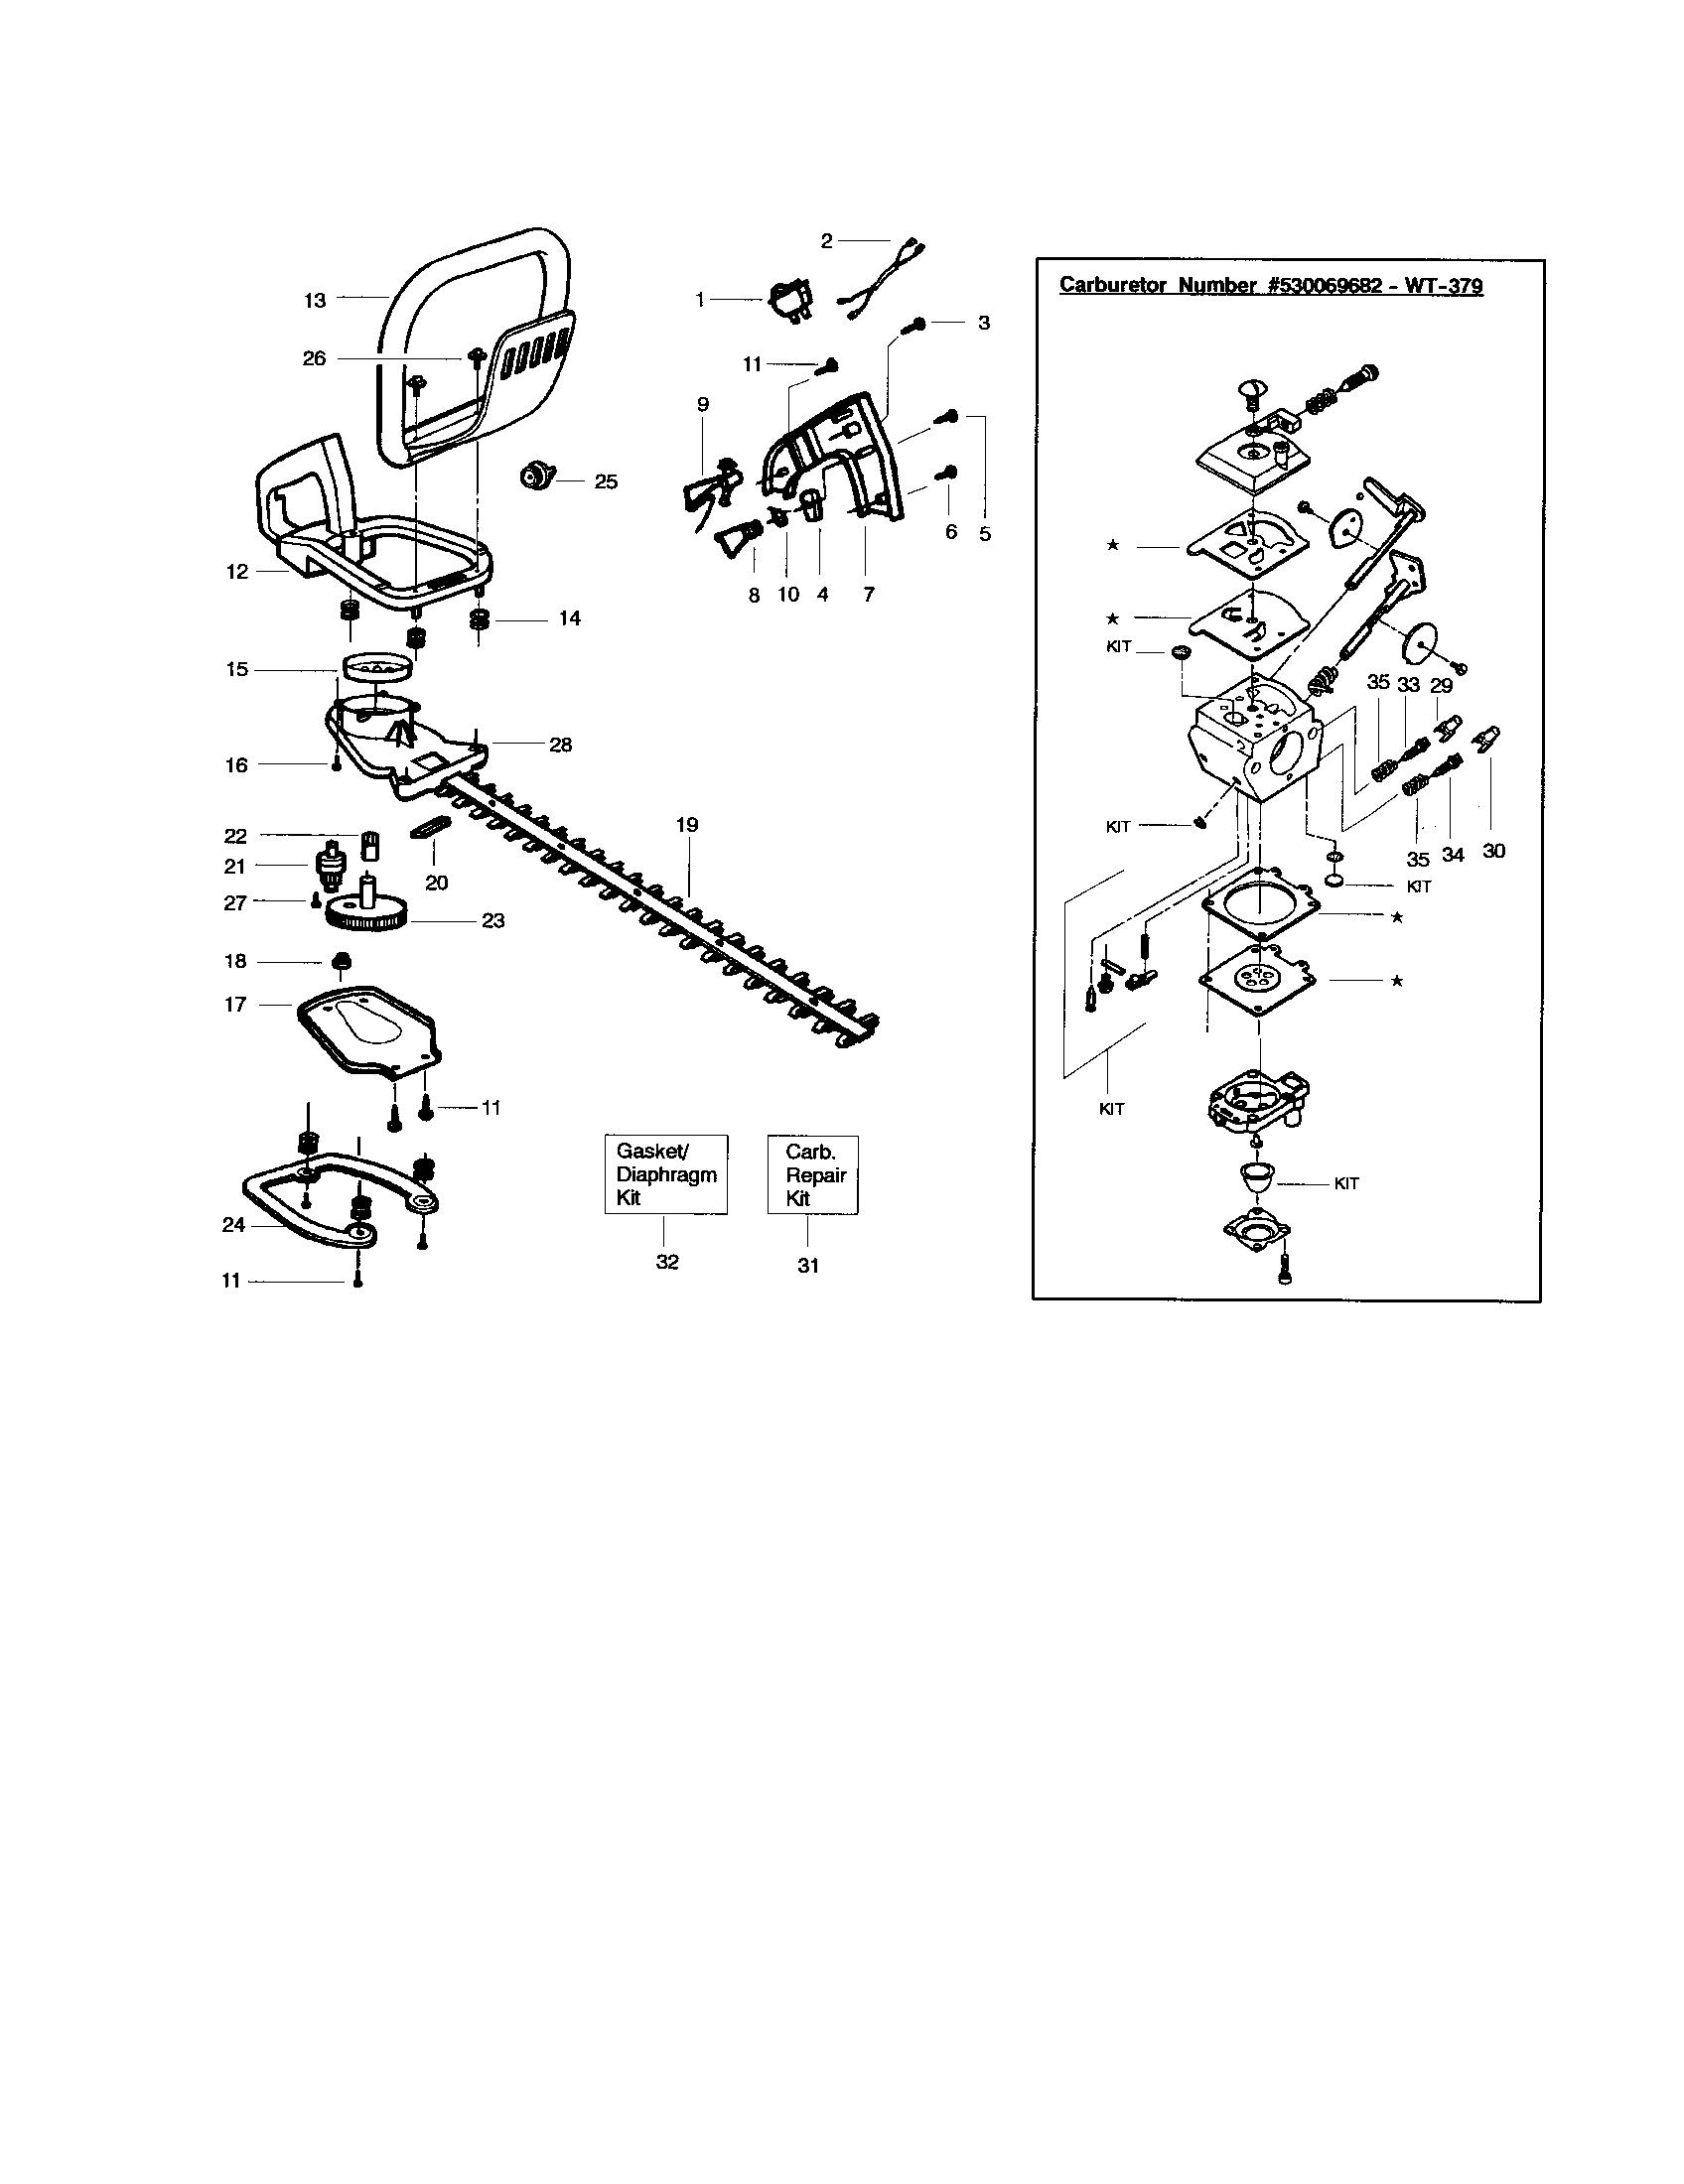 Craftsman model 358795631 hedge trimmer, gas genuine parts